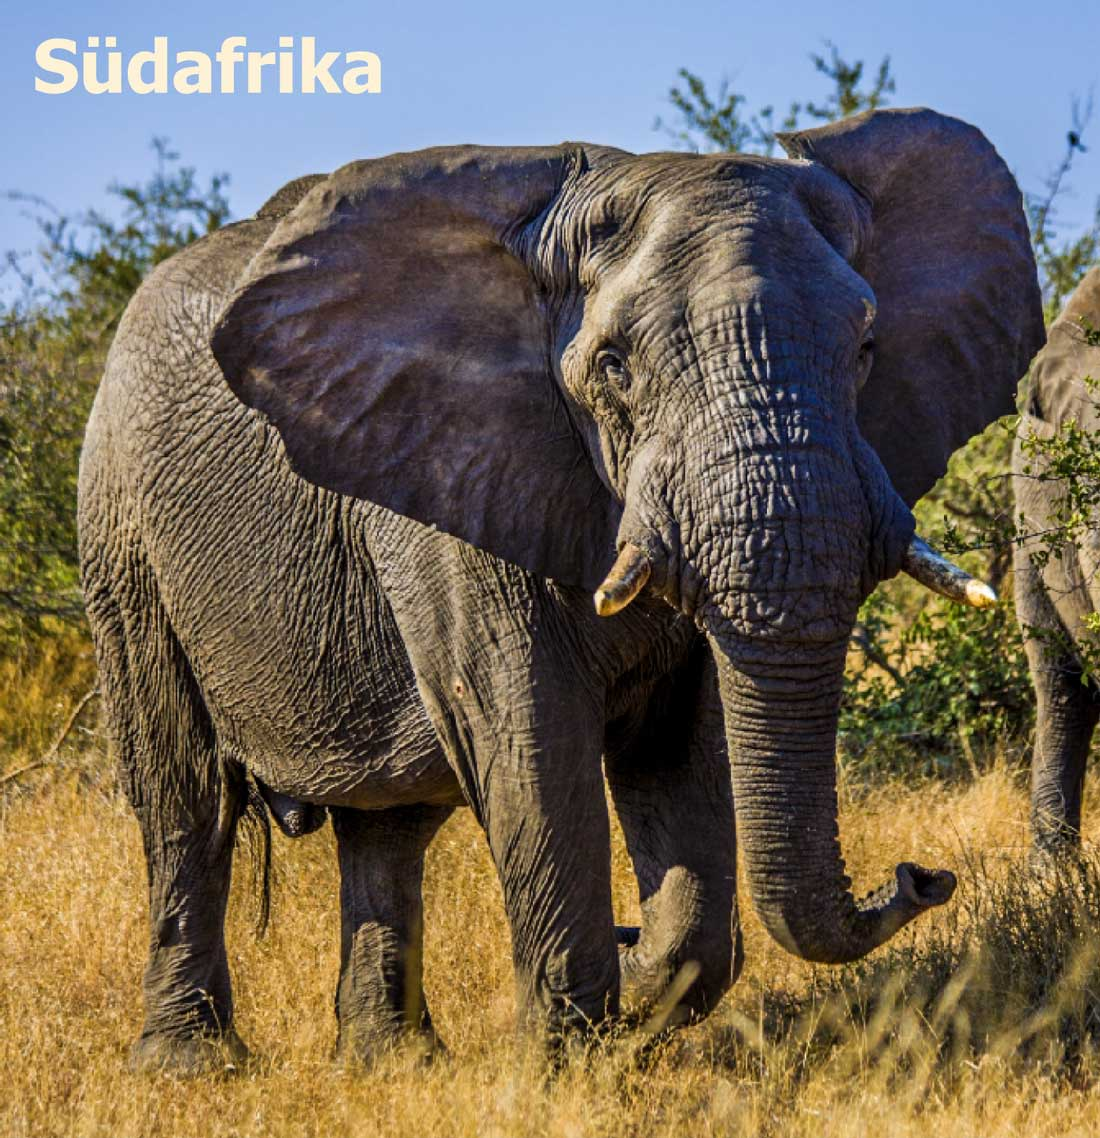 Bildband Südafrika, Reisebildband Südafrika, Reiseführer Südafrika